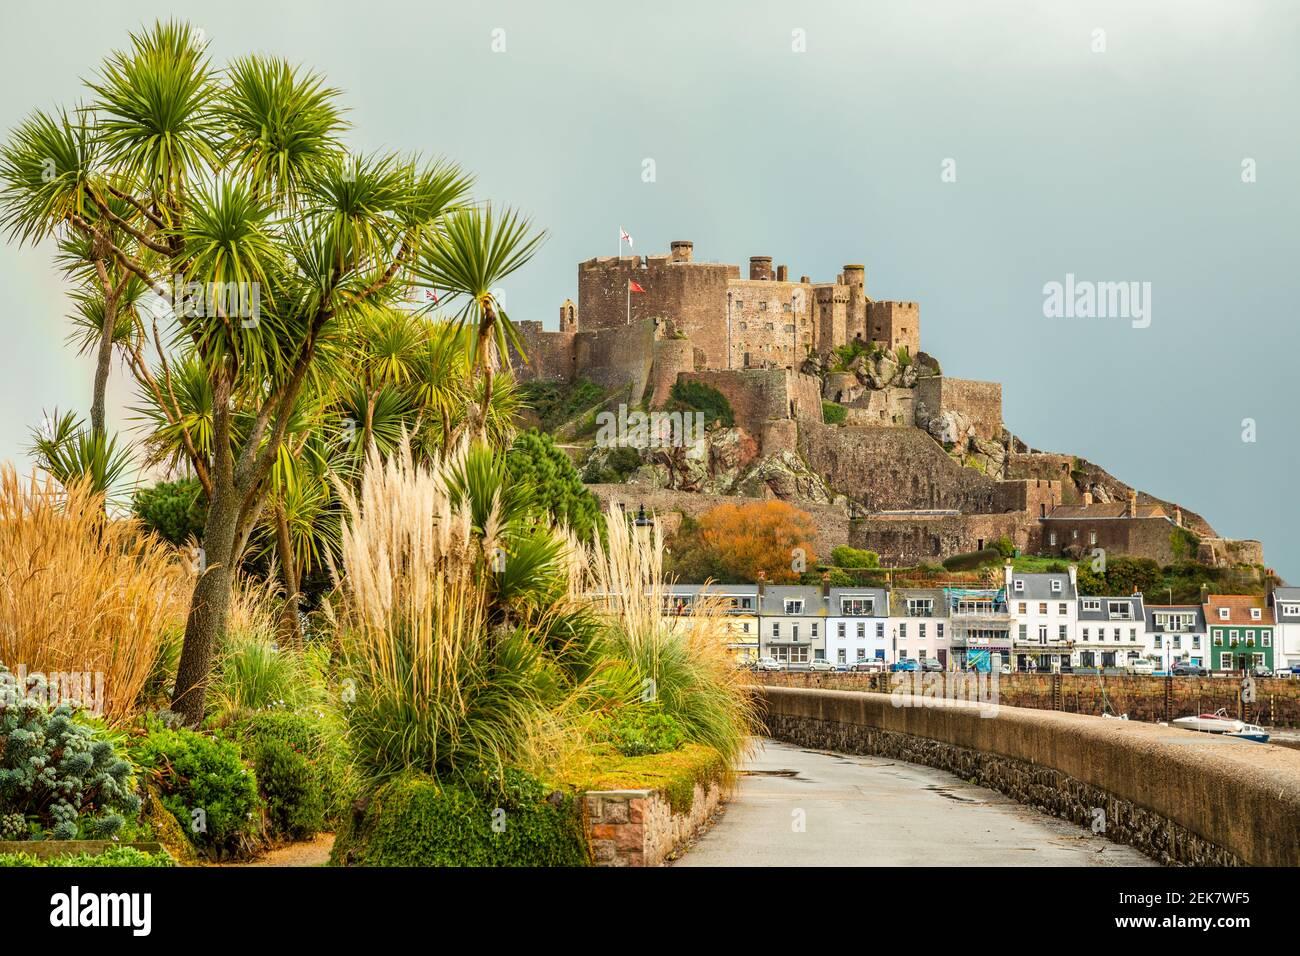 Mount Orgueil castle over the Gorey village, Saint Martin, bailiwick of Jersey, Channel Islands Stock Photo